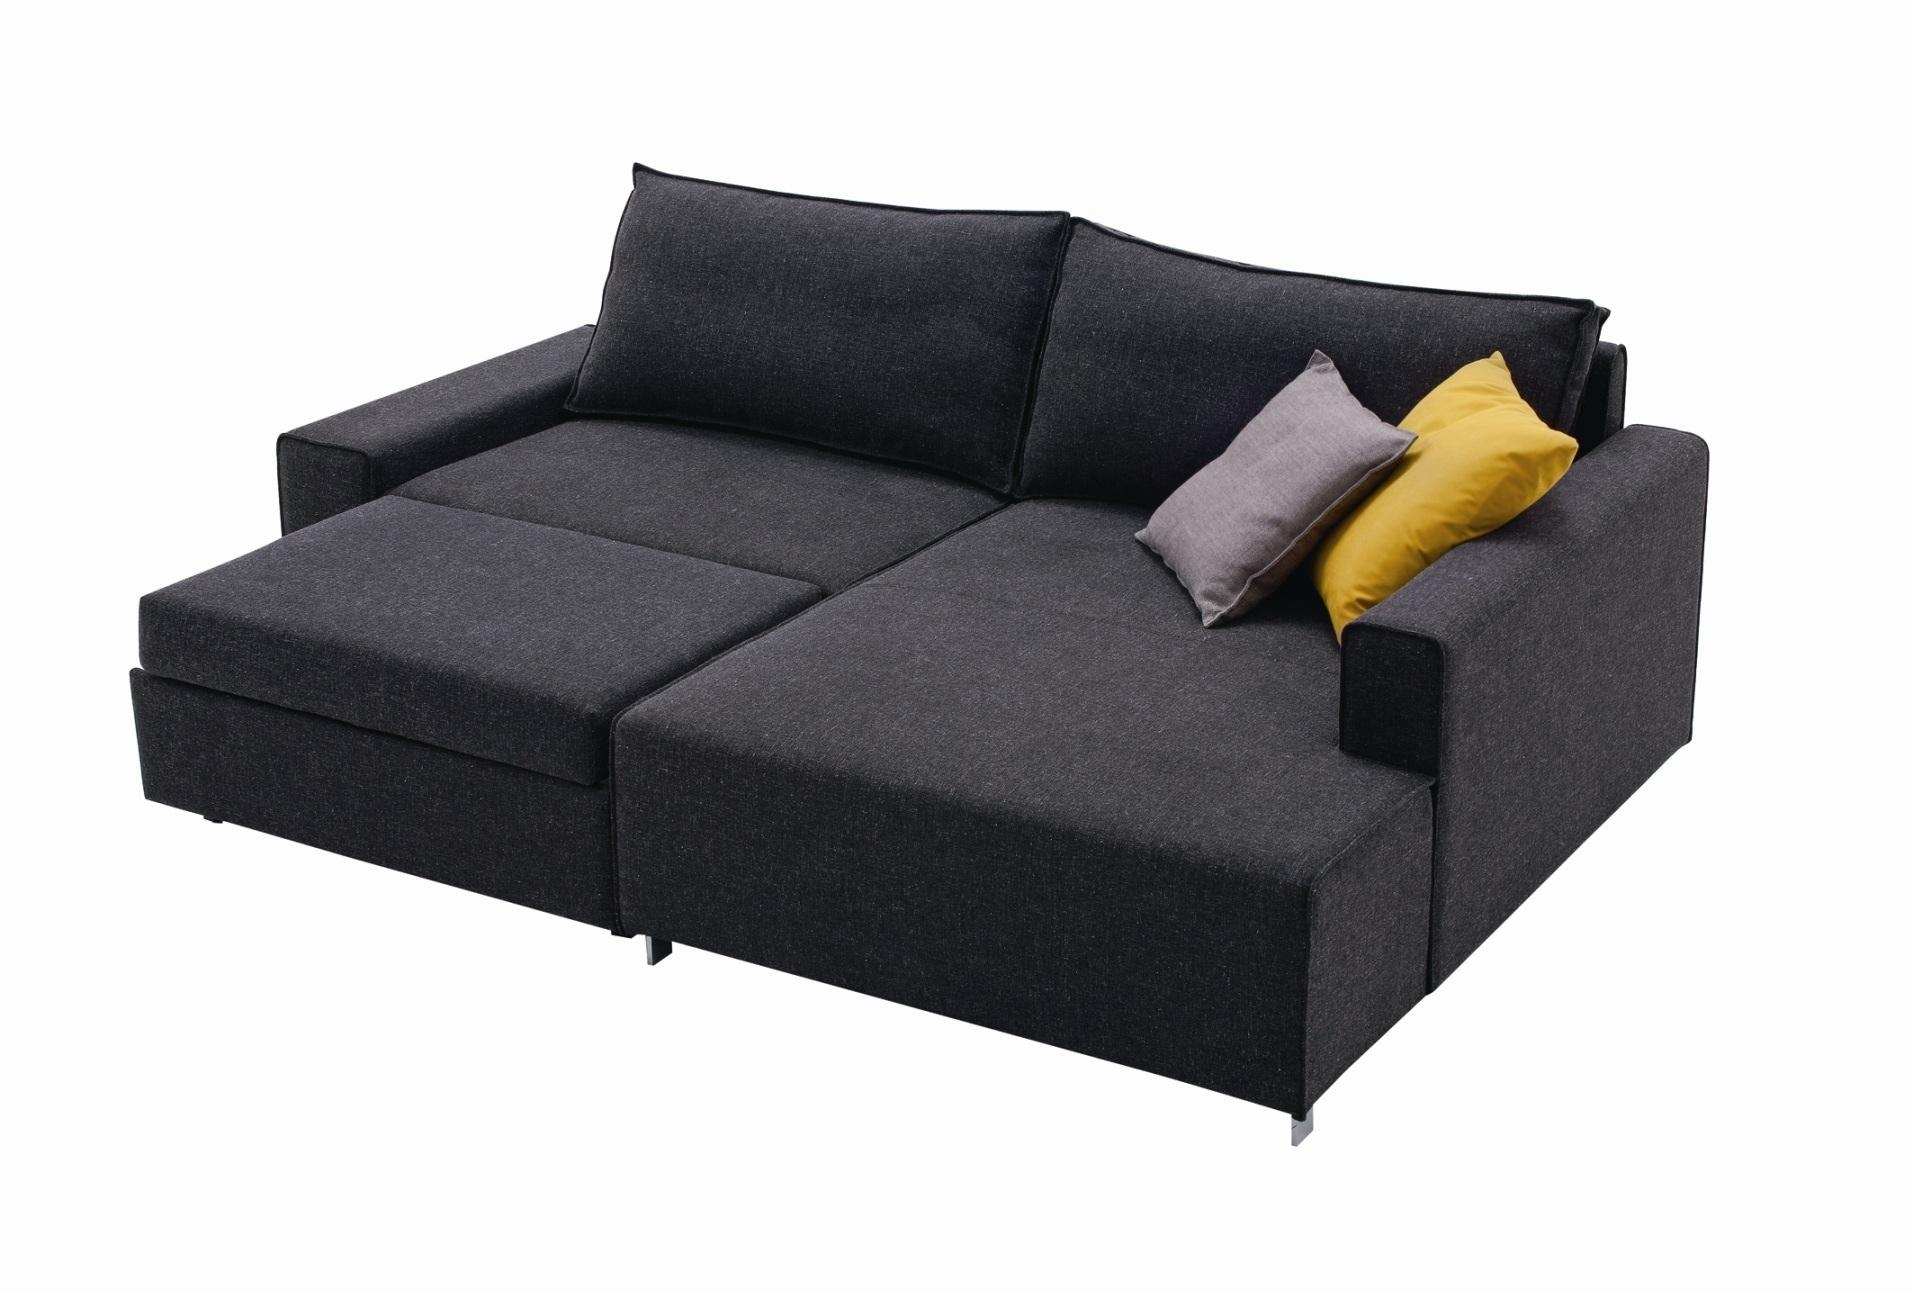 Sofas: Cheap Sleeper Sofa Sets | Cheap Loveseats | Cheap Sofa Sleepers For Mini Sofa Sleepers (View 20 of 20)